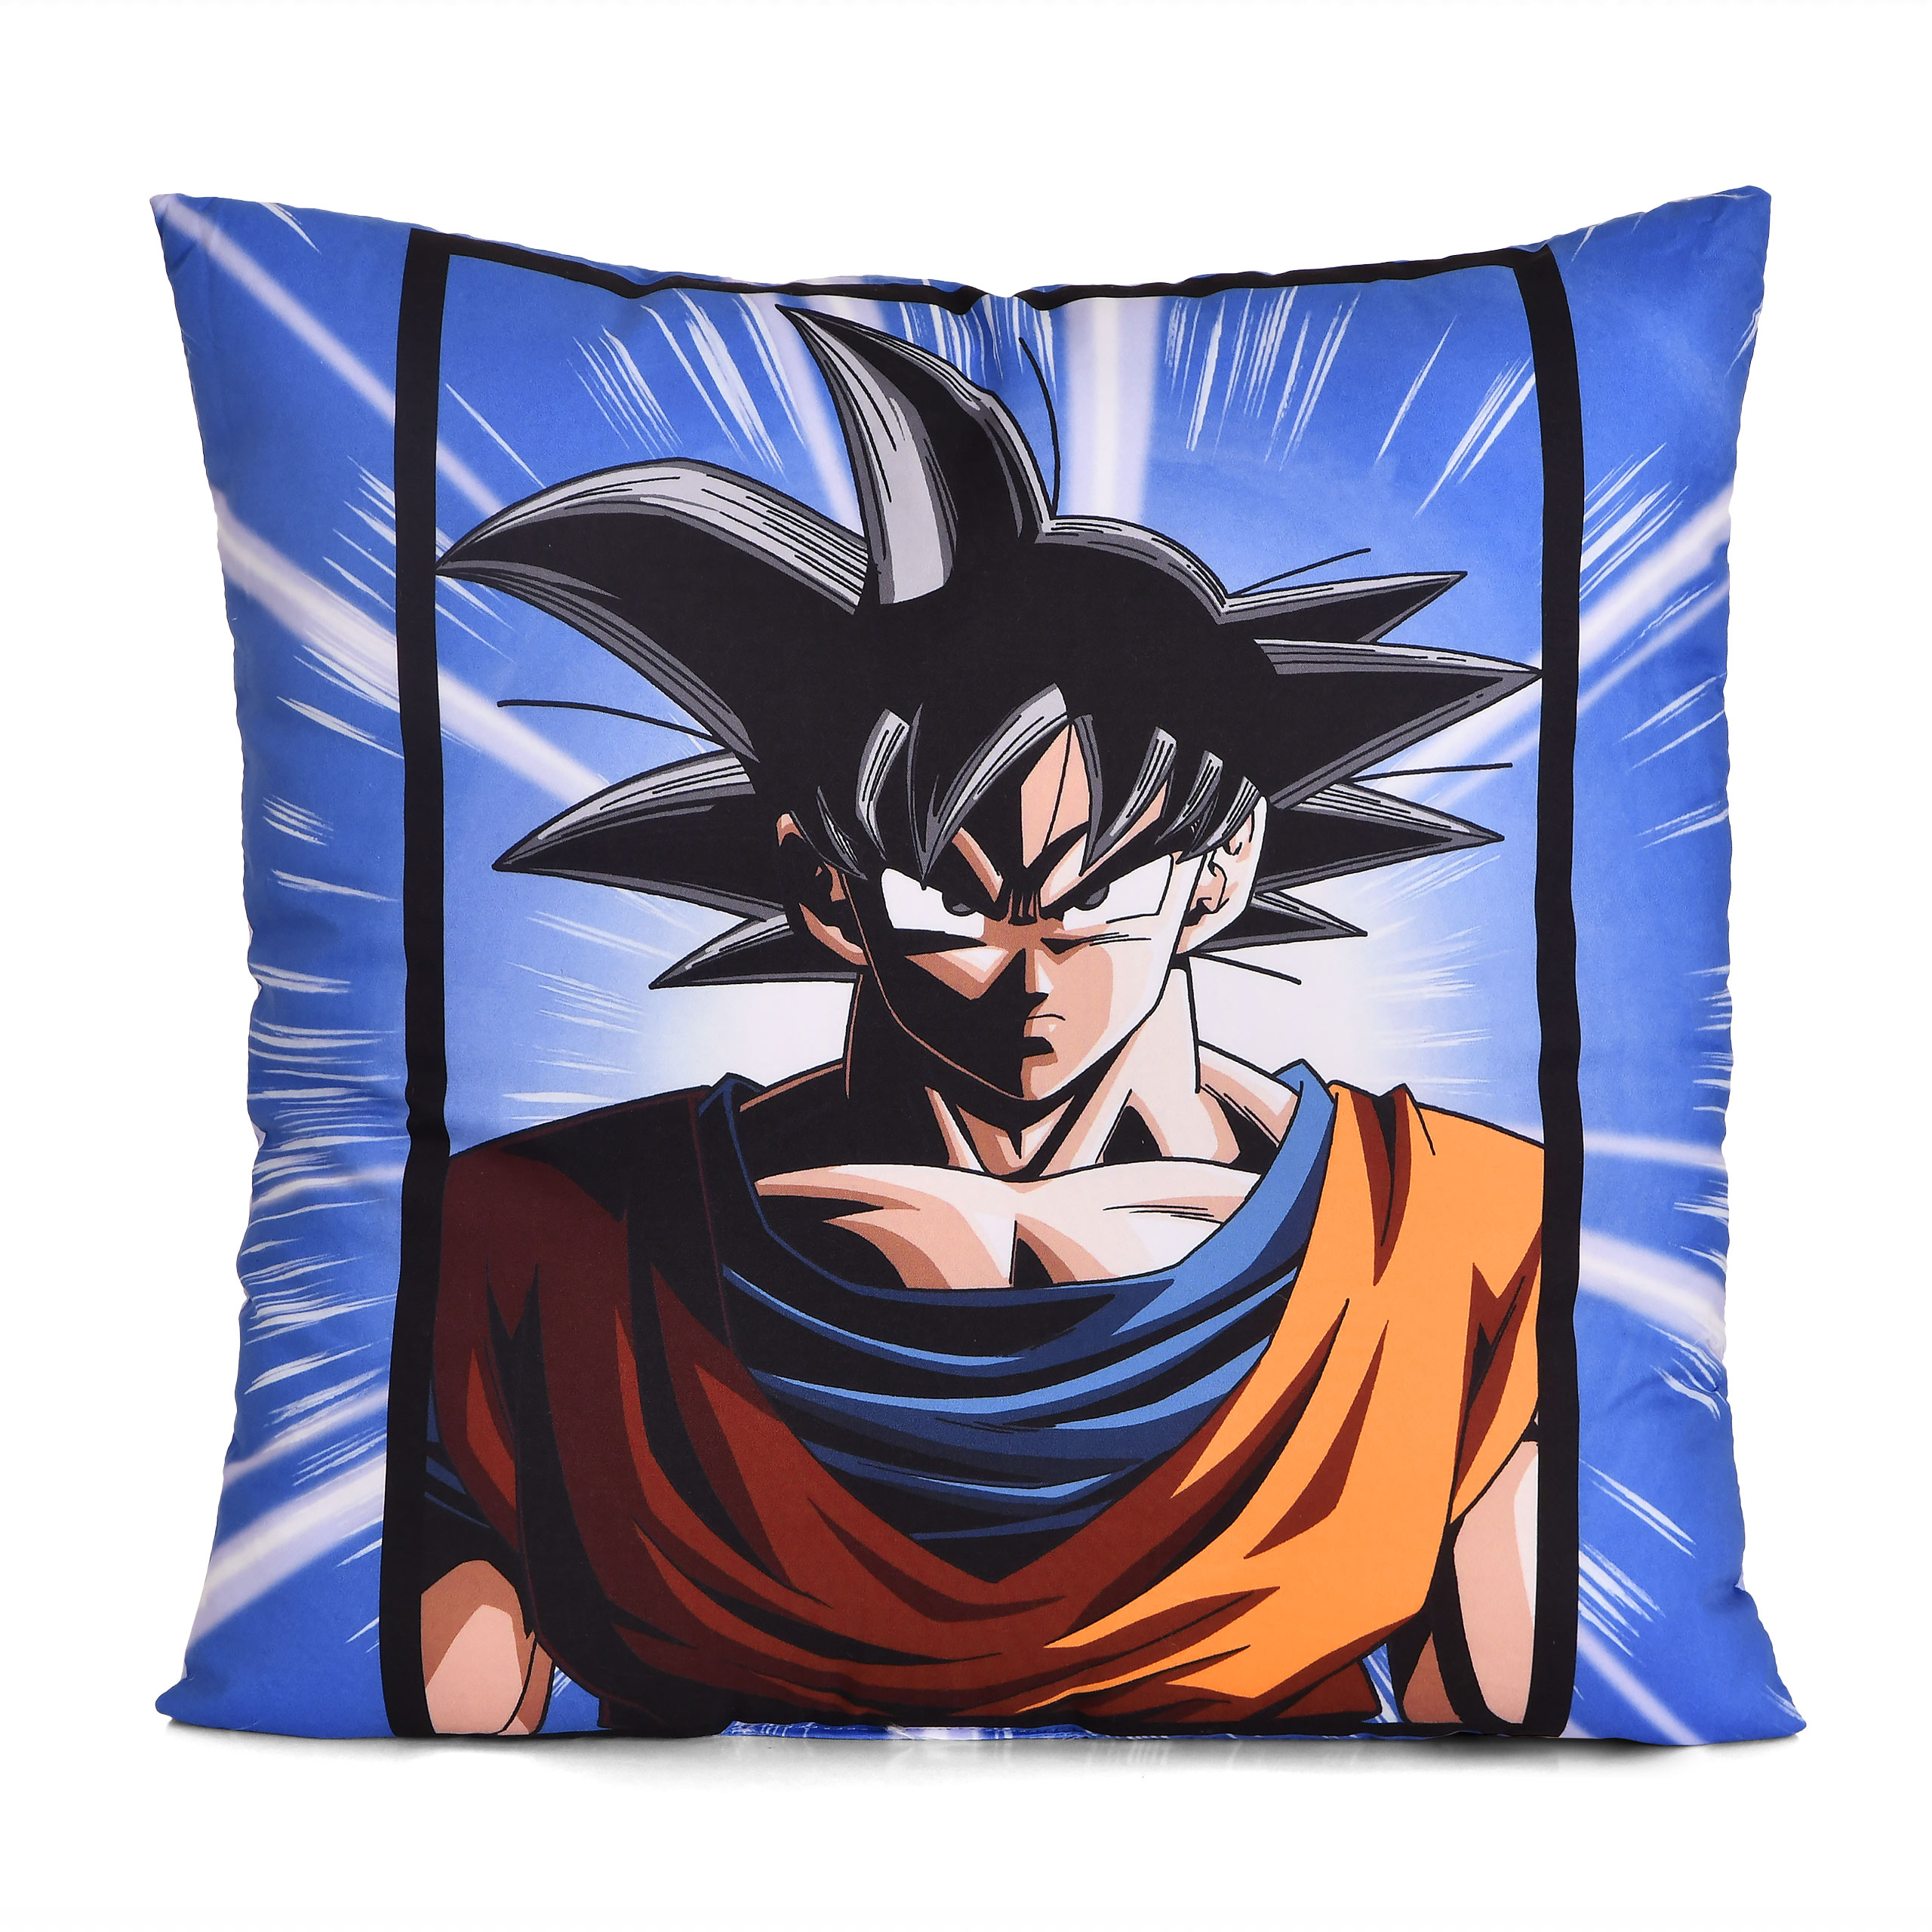 Dragon Ball Z - Son Goku und Vegeta Kissen